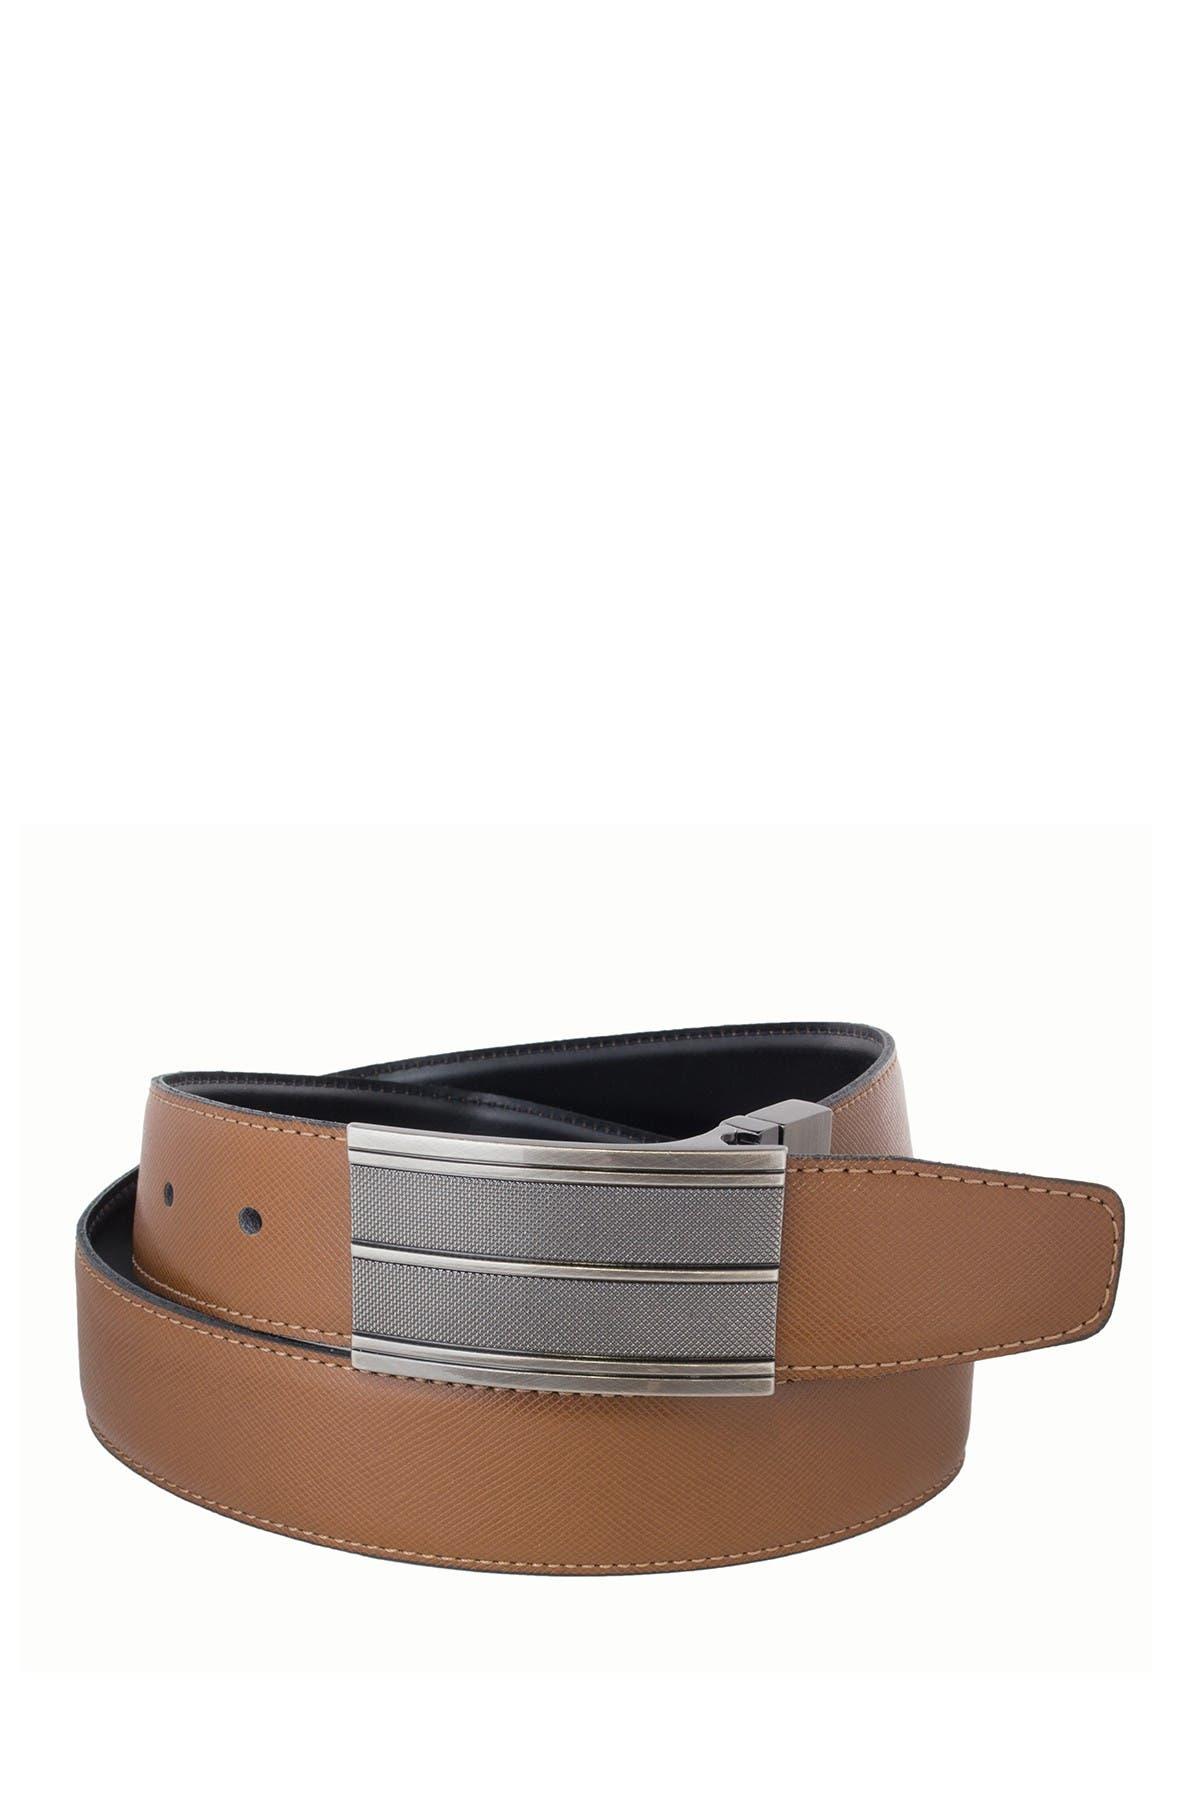 Image of BOSCA Reversible 35mm Saffiano Leather Belt